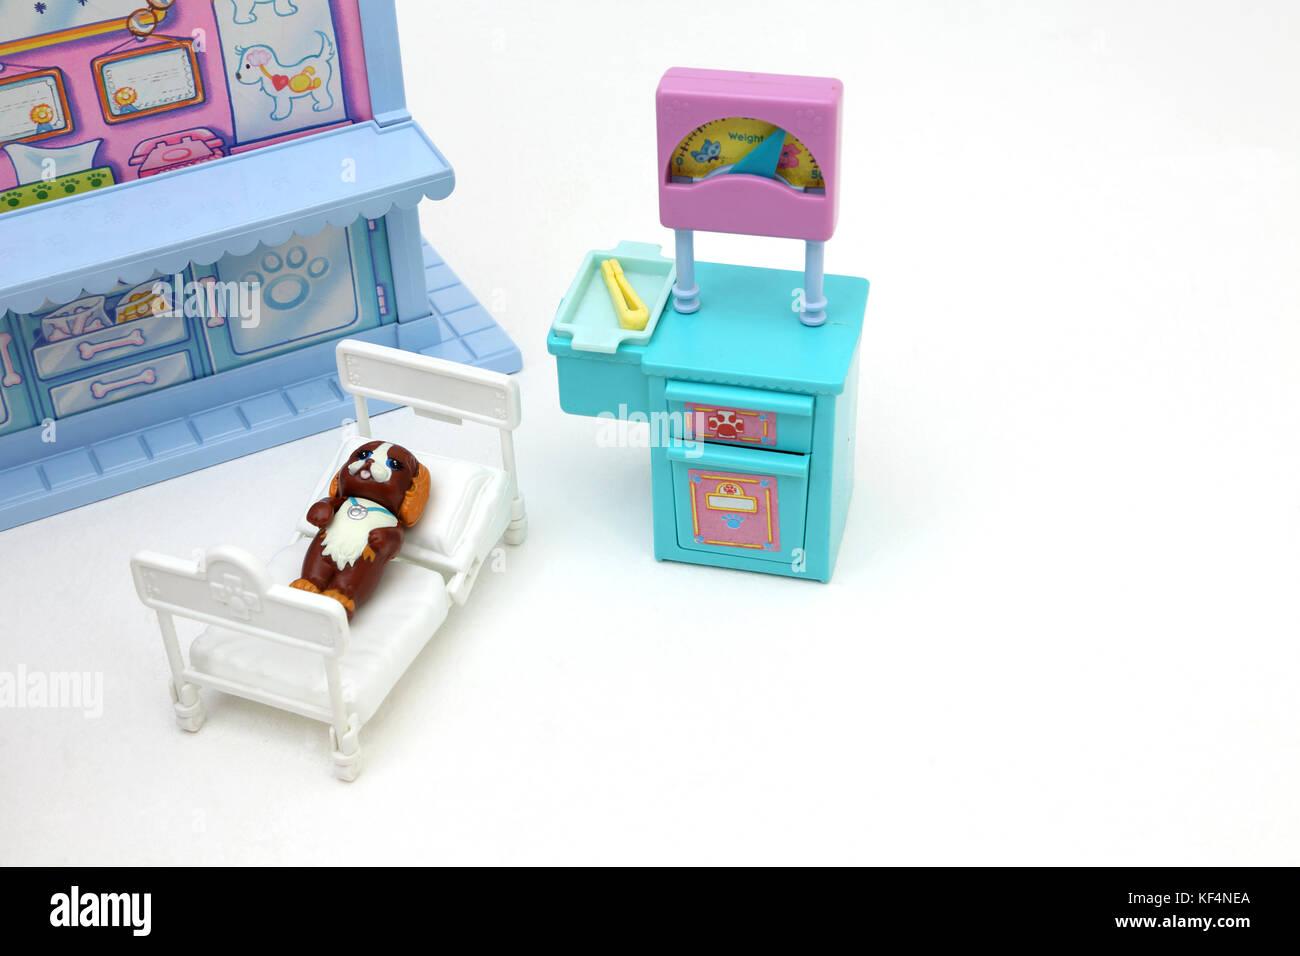 Vintage 1990's Toy Littlest Pet Shop Care Centre Dog in bed - Stock Image